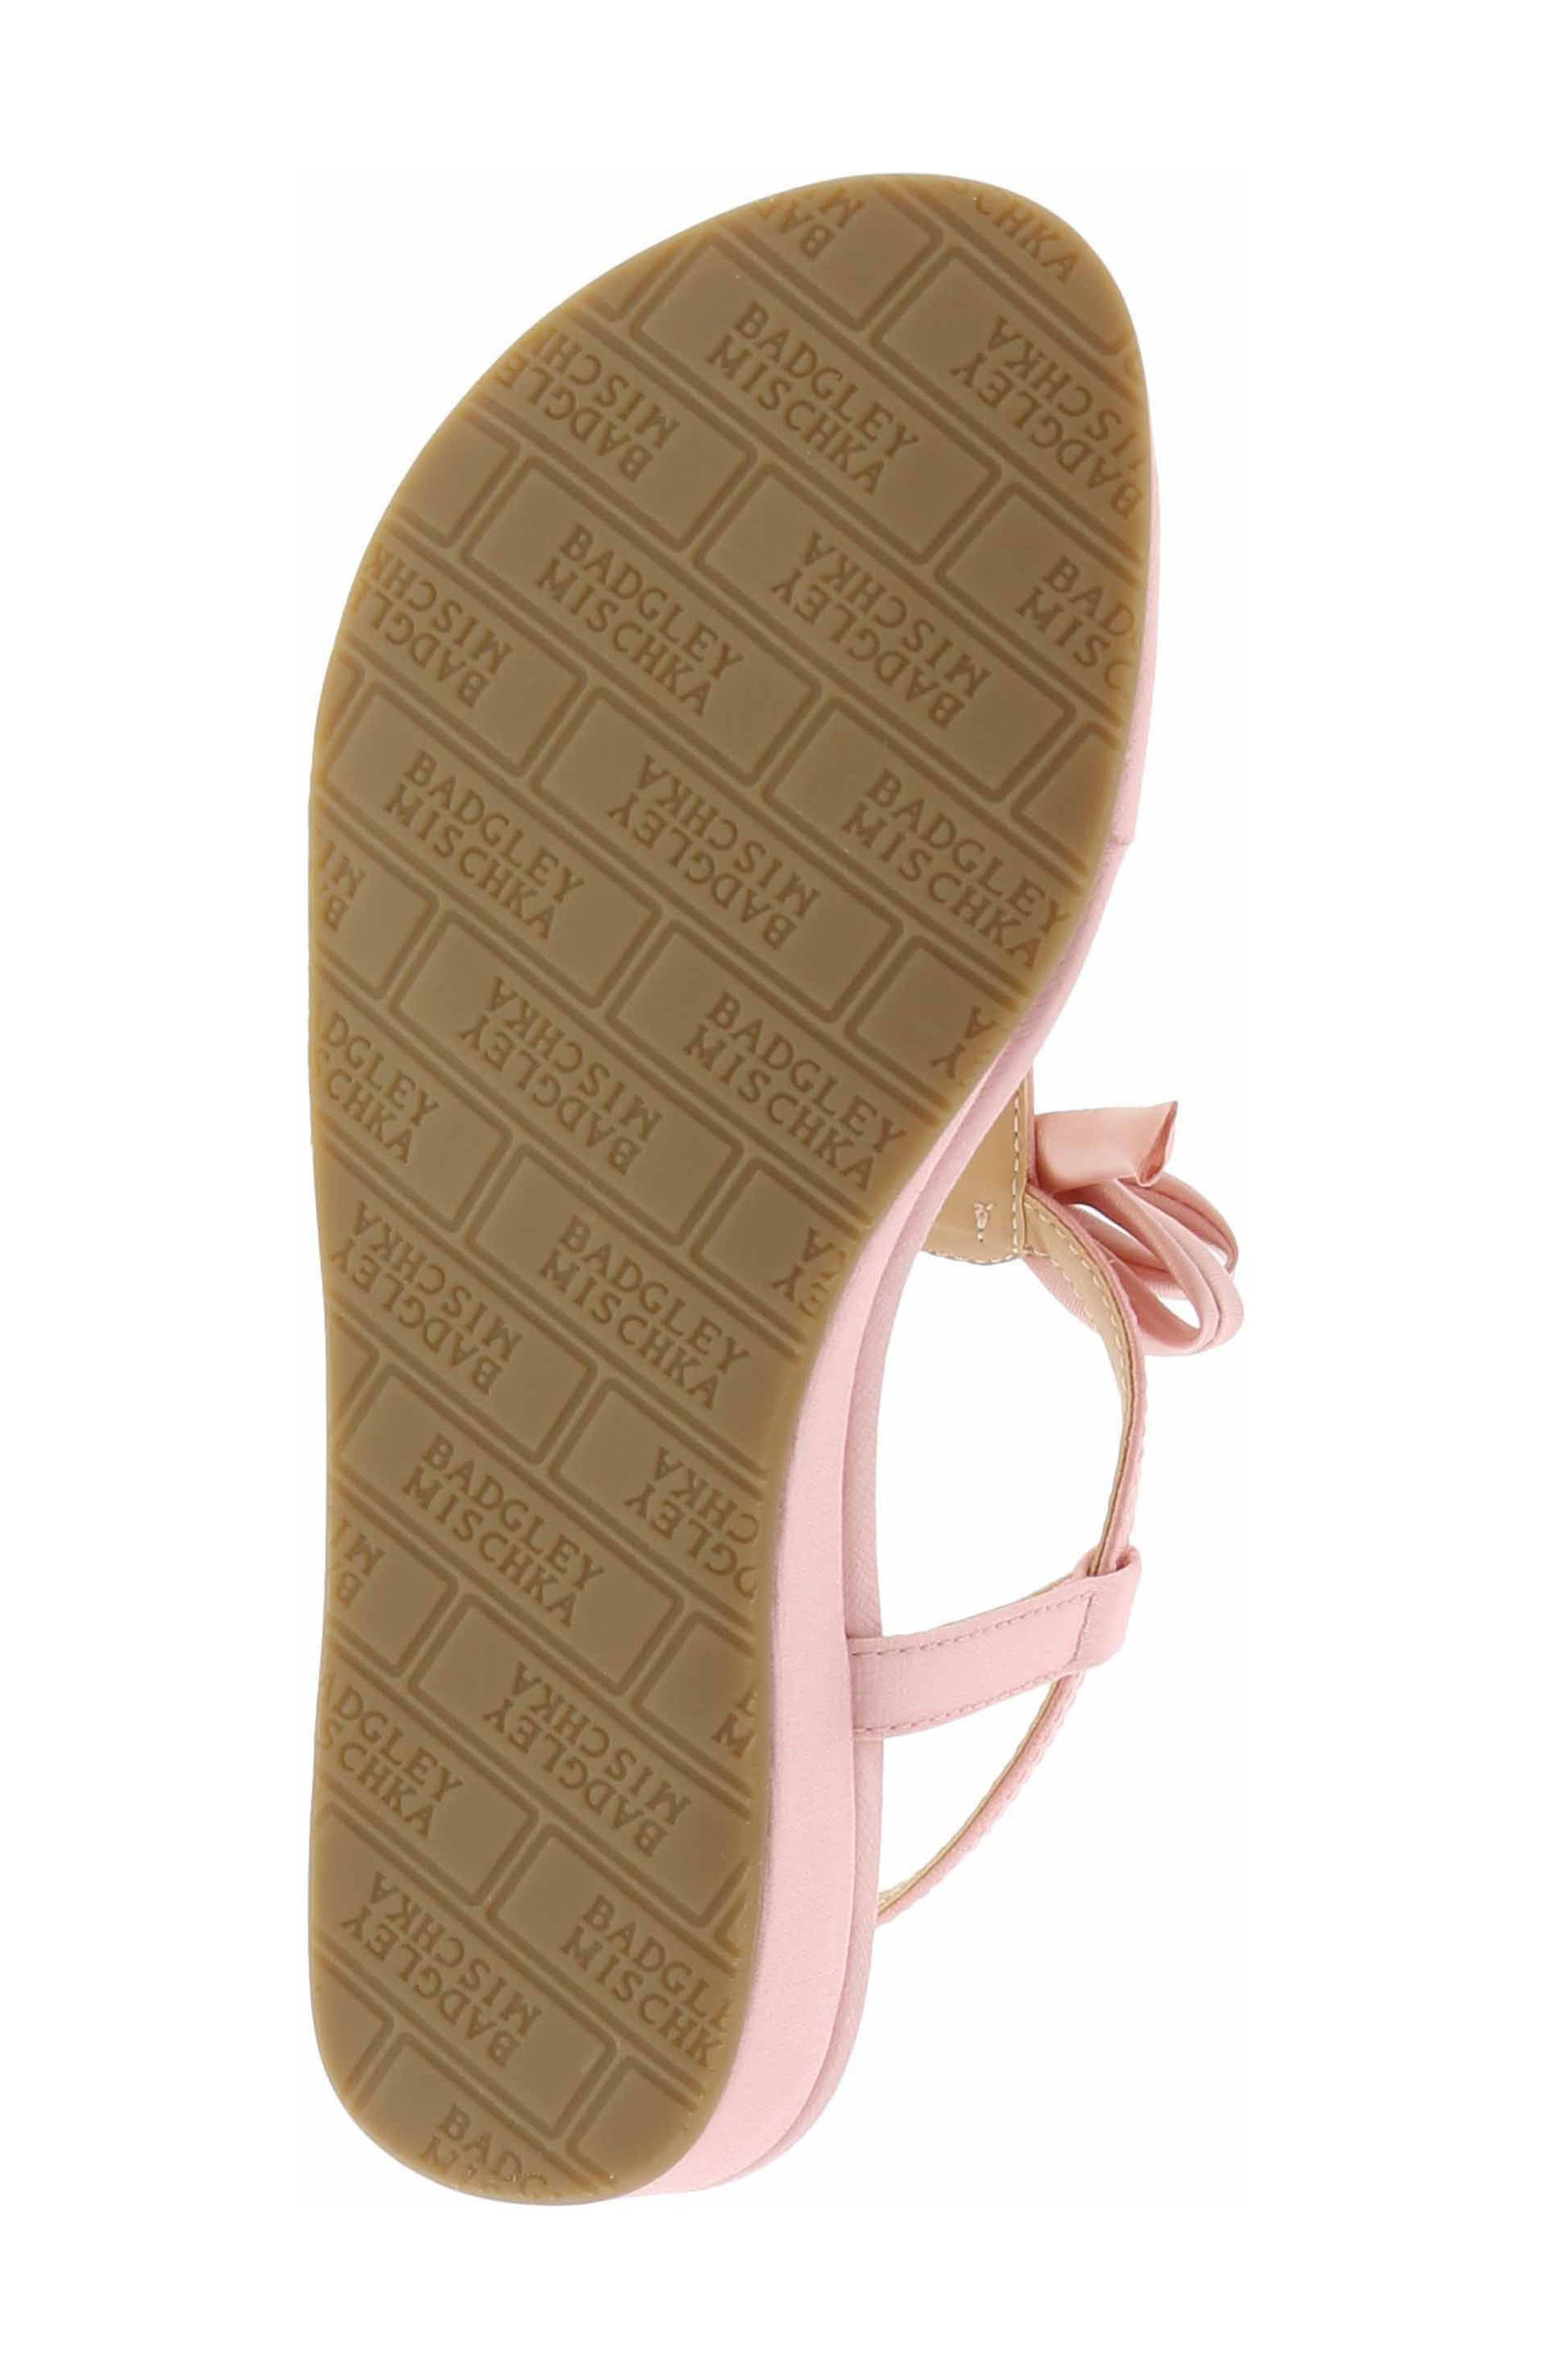 Talia Embellished Bow Sandal,                             Alternate thumbnail 6, color,                             Light Pink